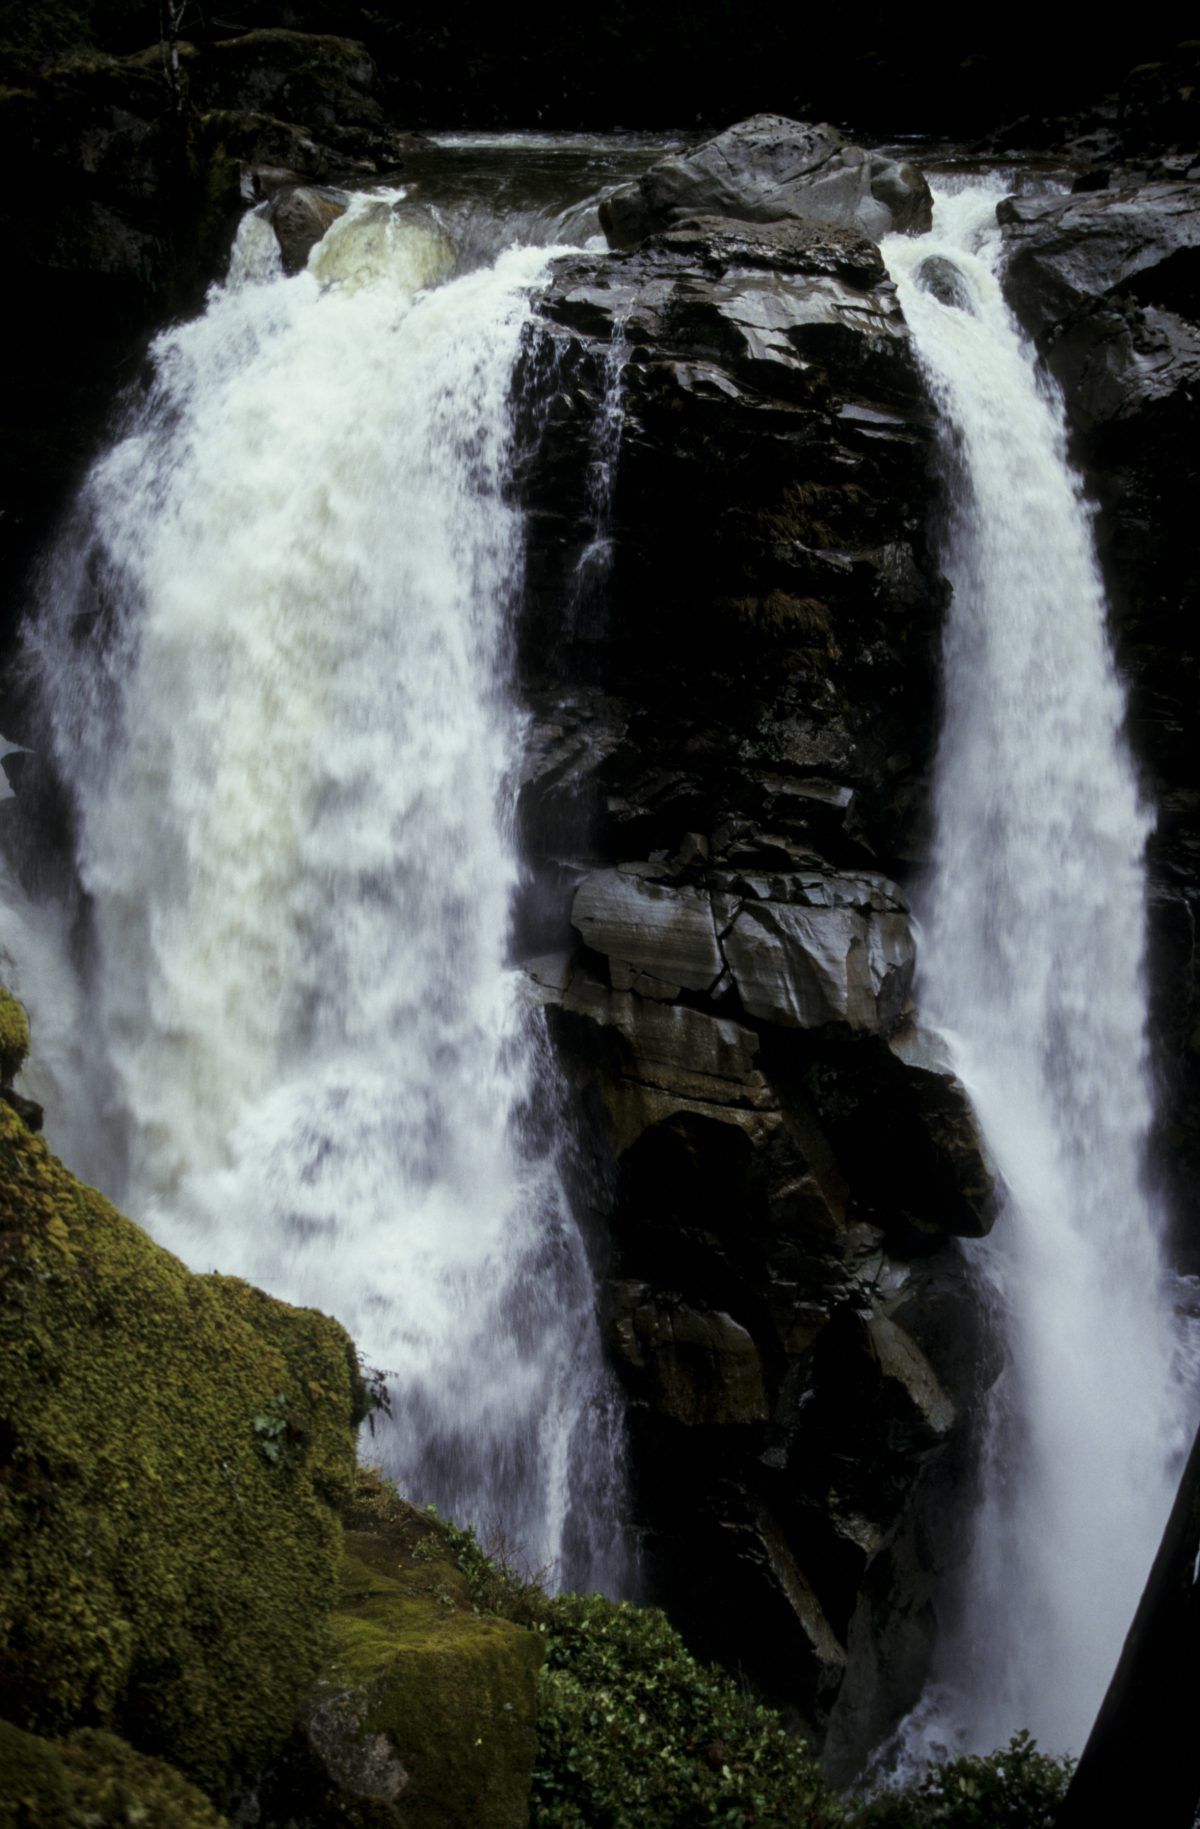 Waterfall - by mount Baker, river, waterfall